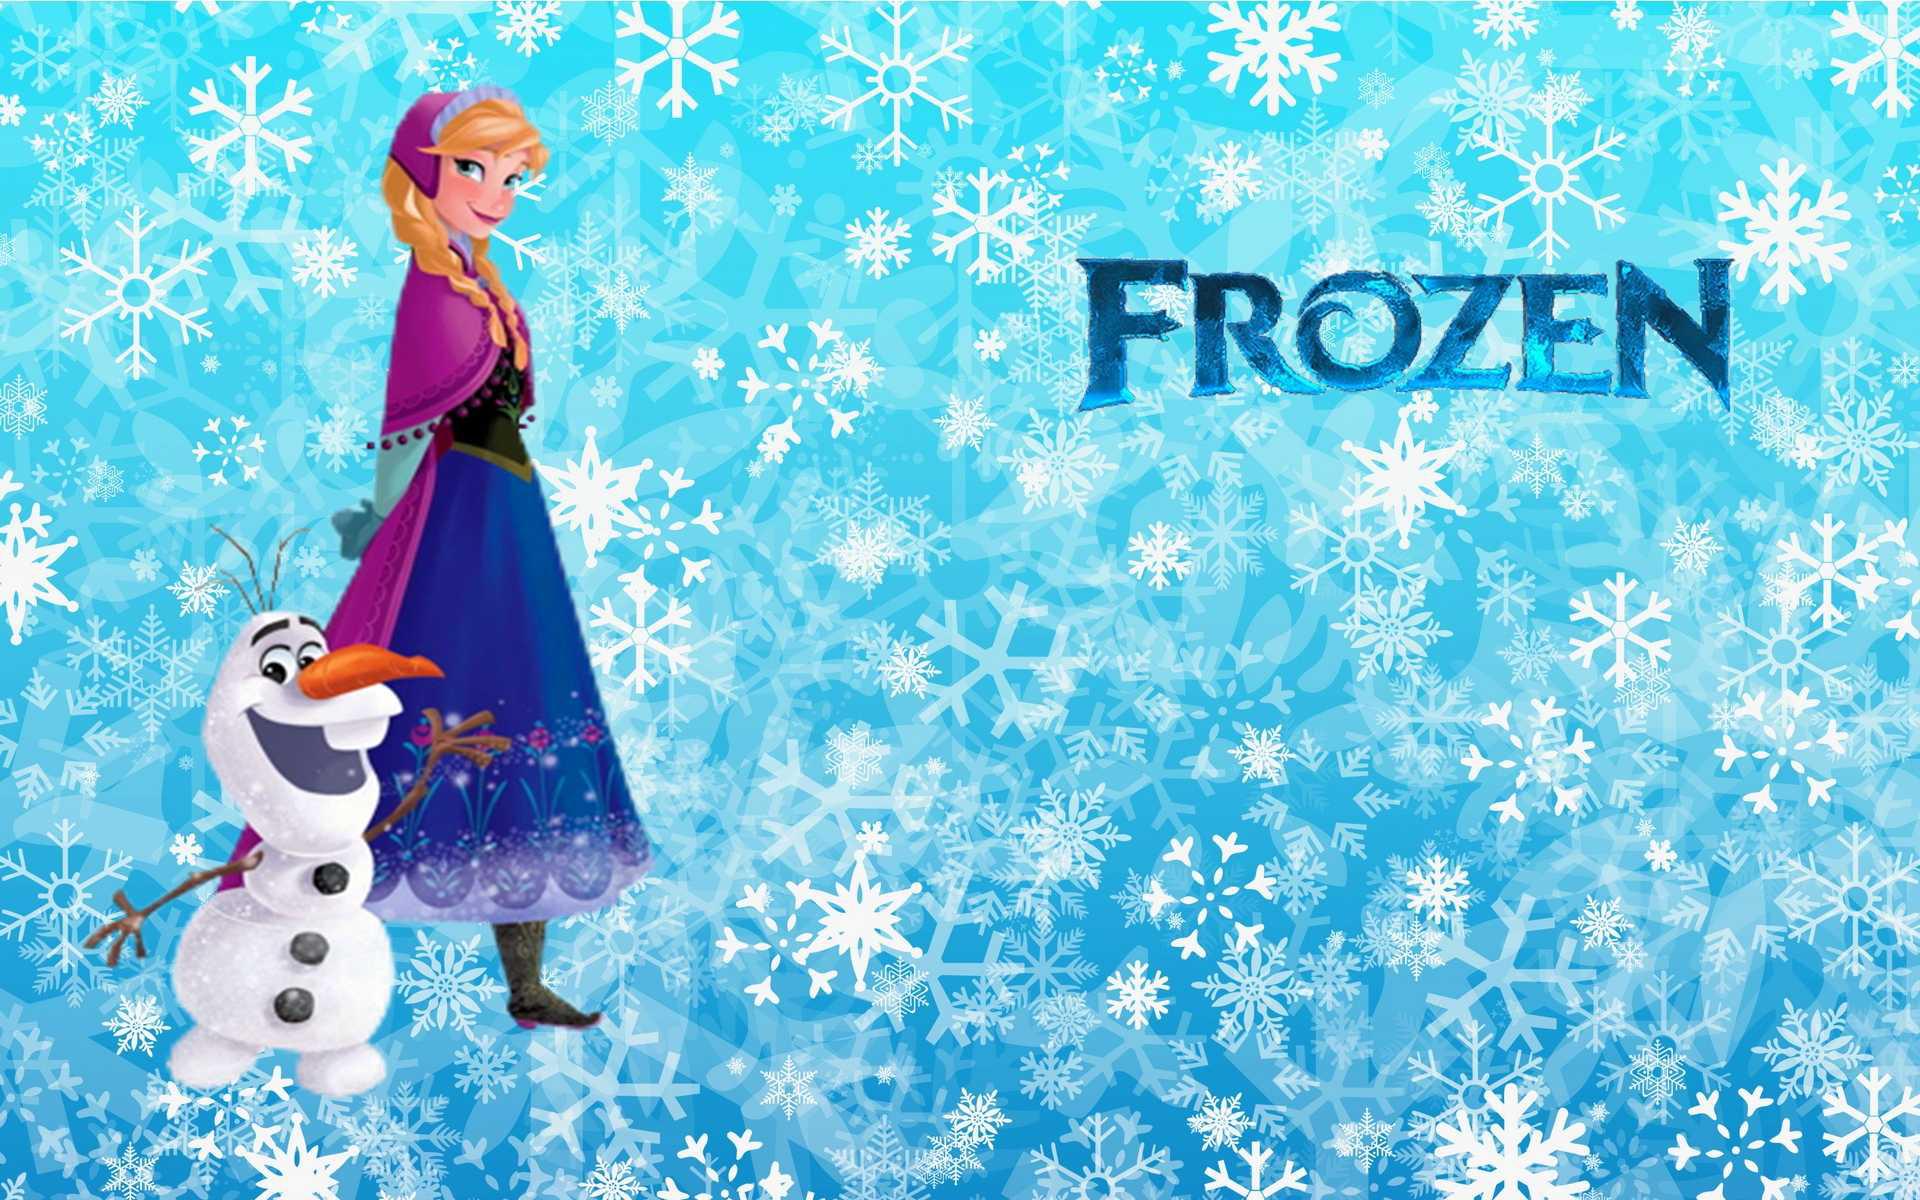 Frozen HD Wallpaper | Achtergrond | 1920x1200 | ID:491194 ... Disney Frozen Sven Wallpaper